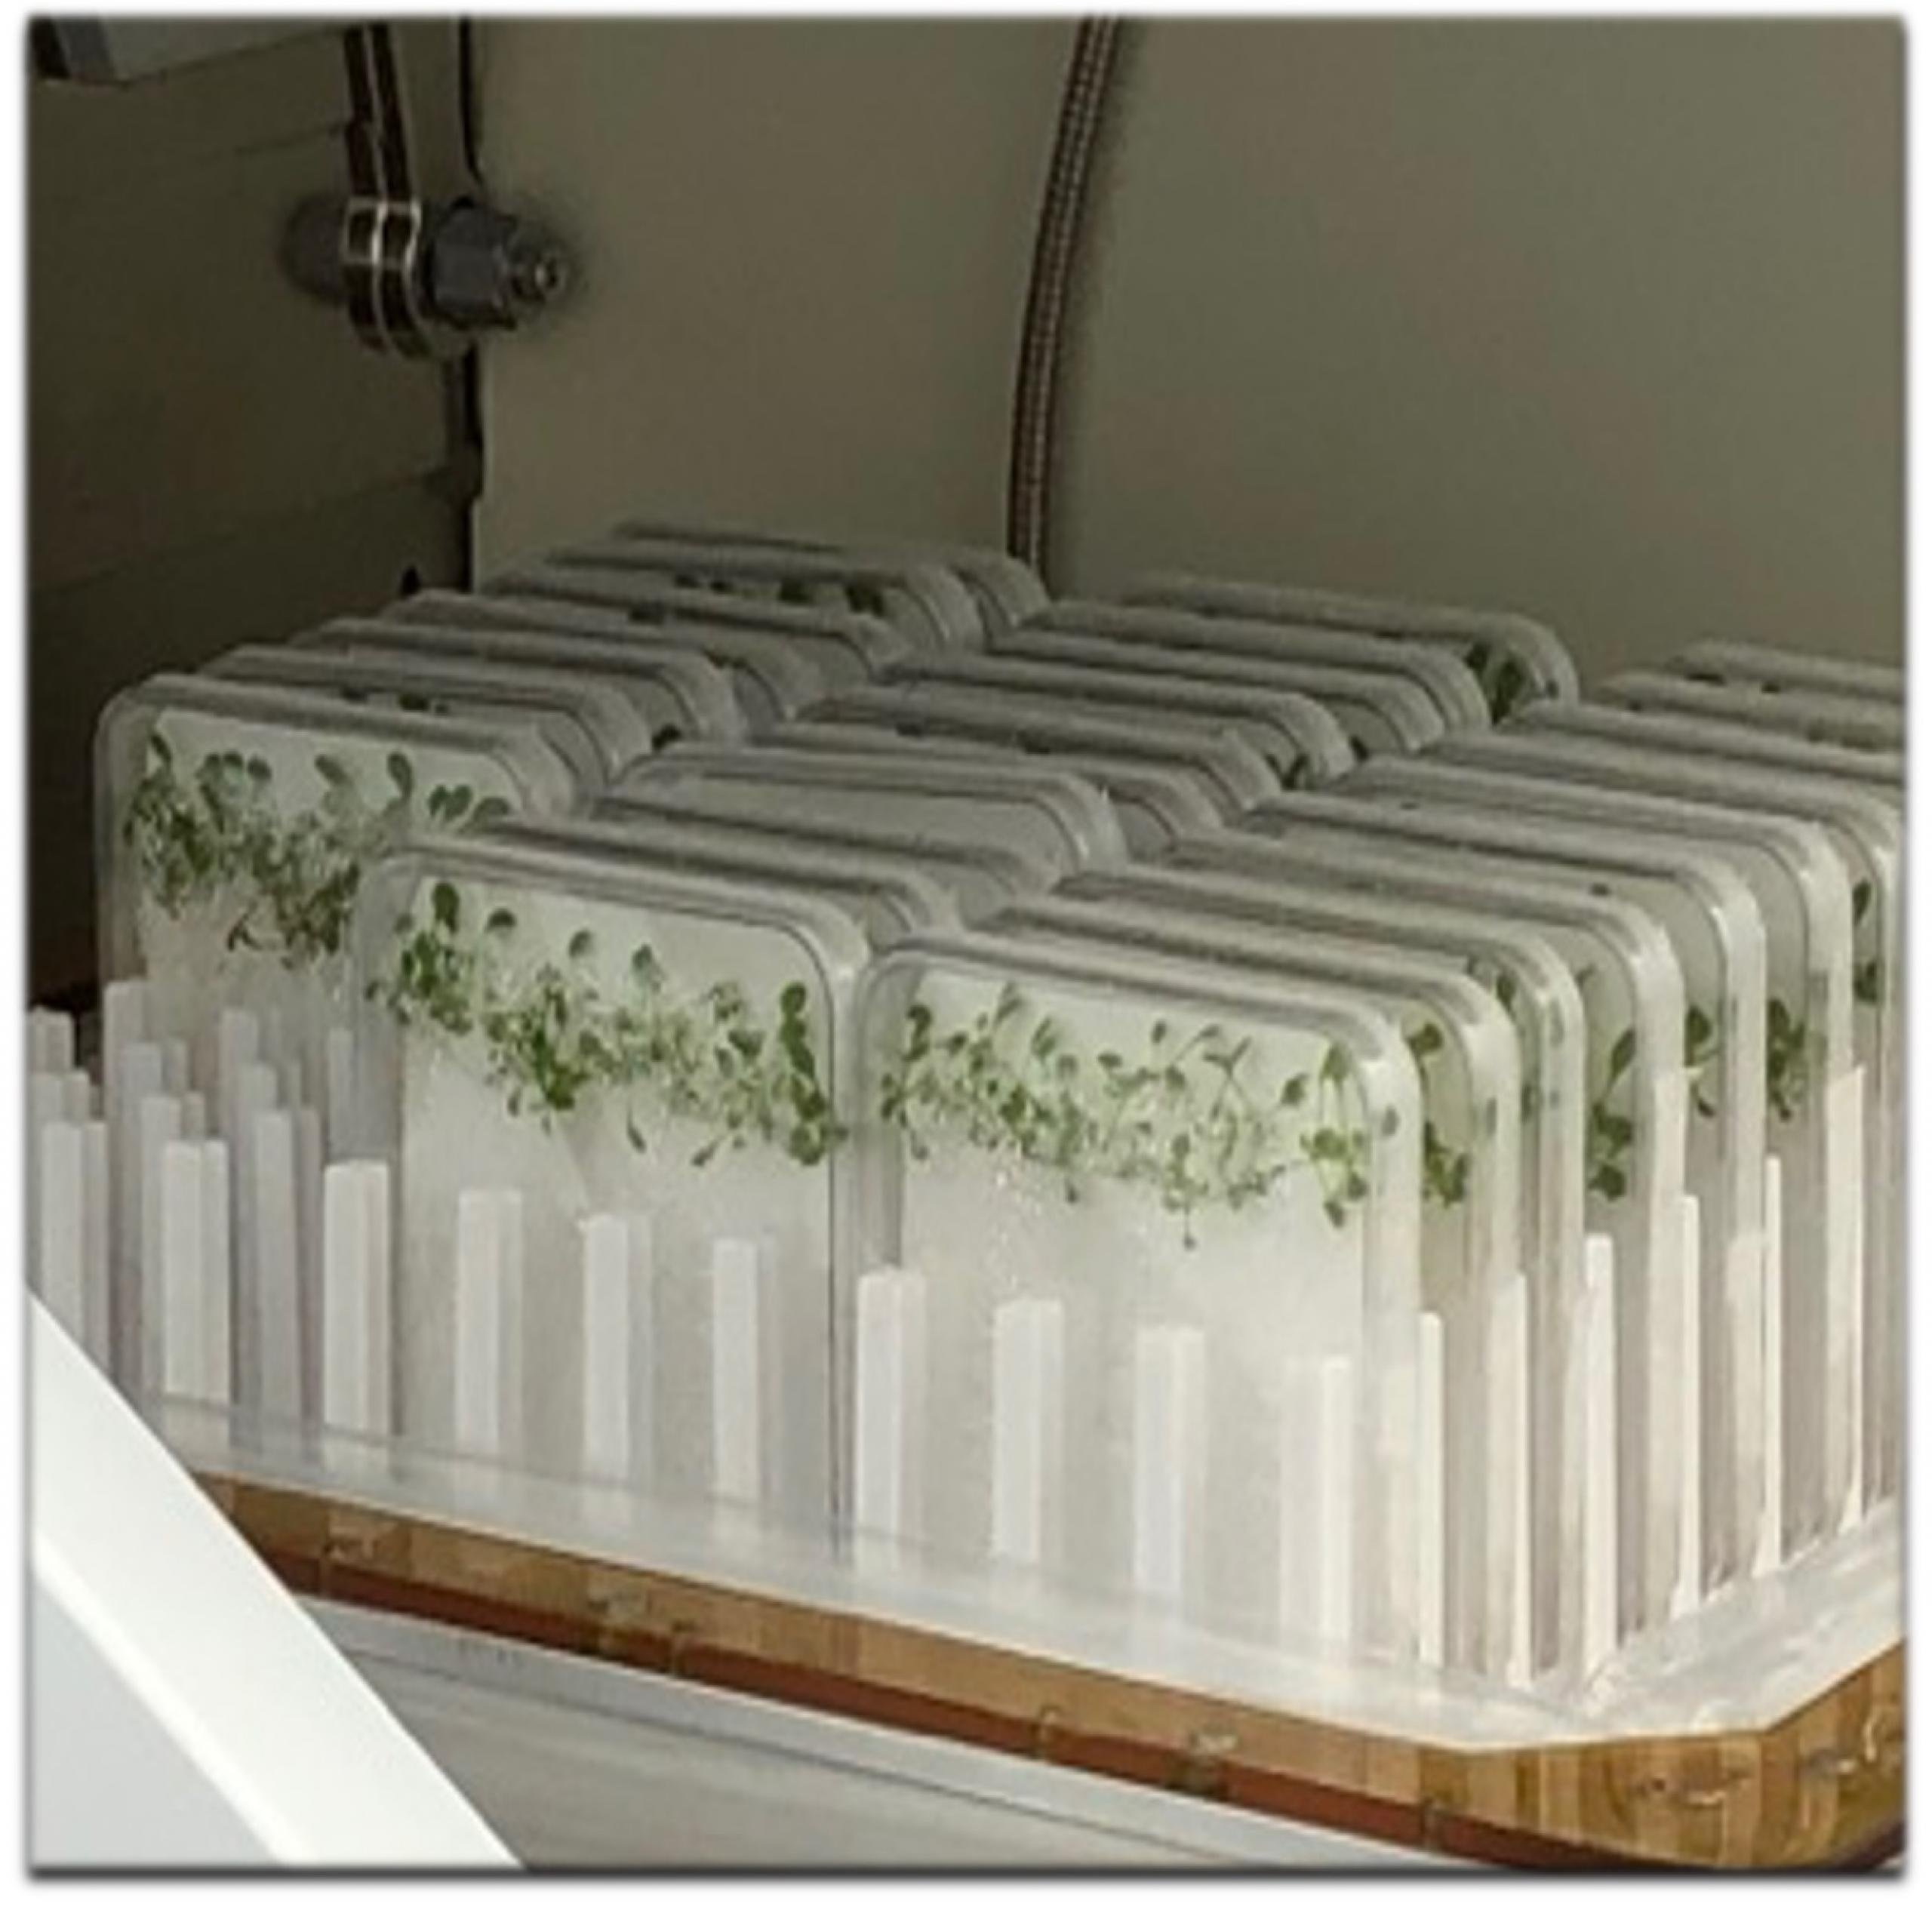 Photo of trays of seedlings